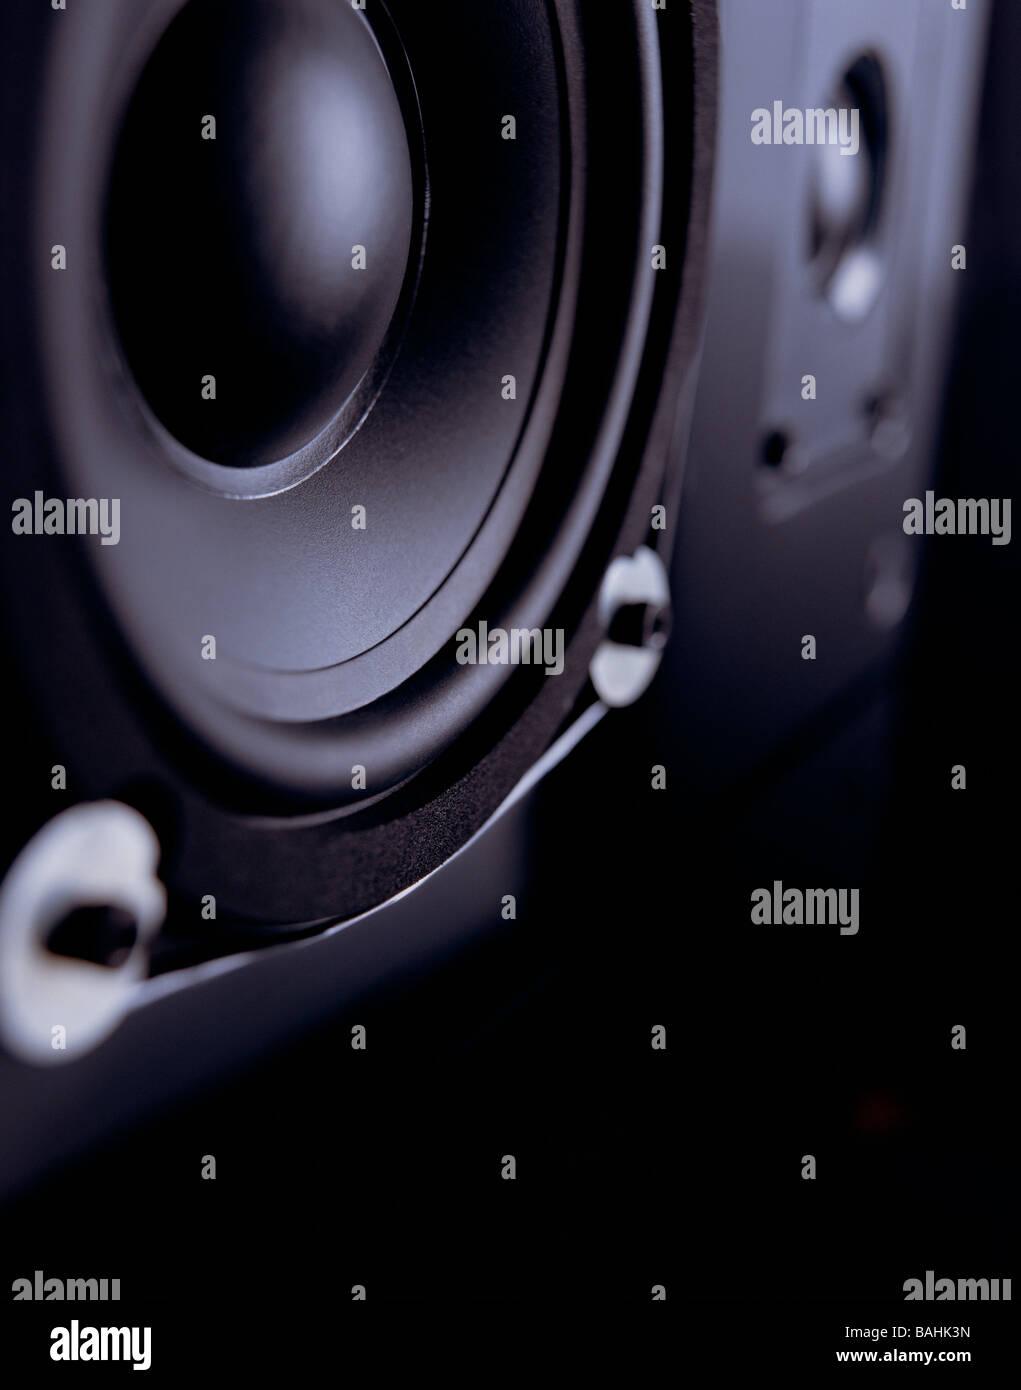 Black Bass Speaker on Black Lacquered Table - Stock Image